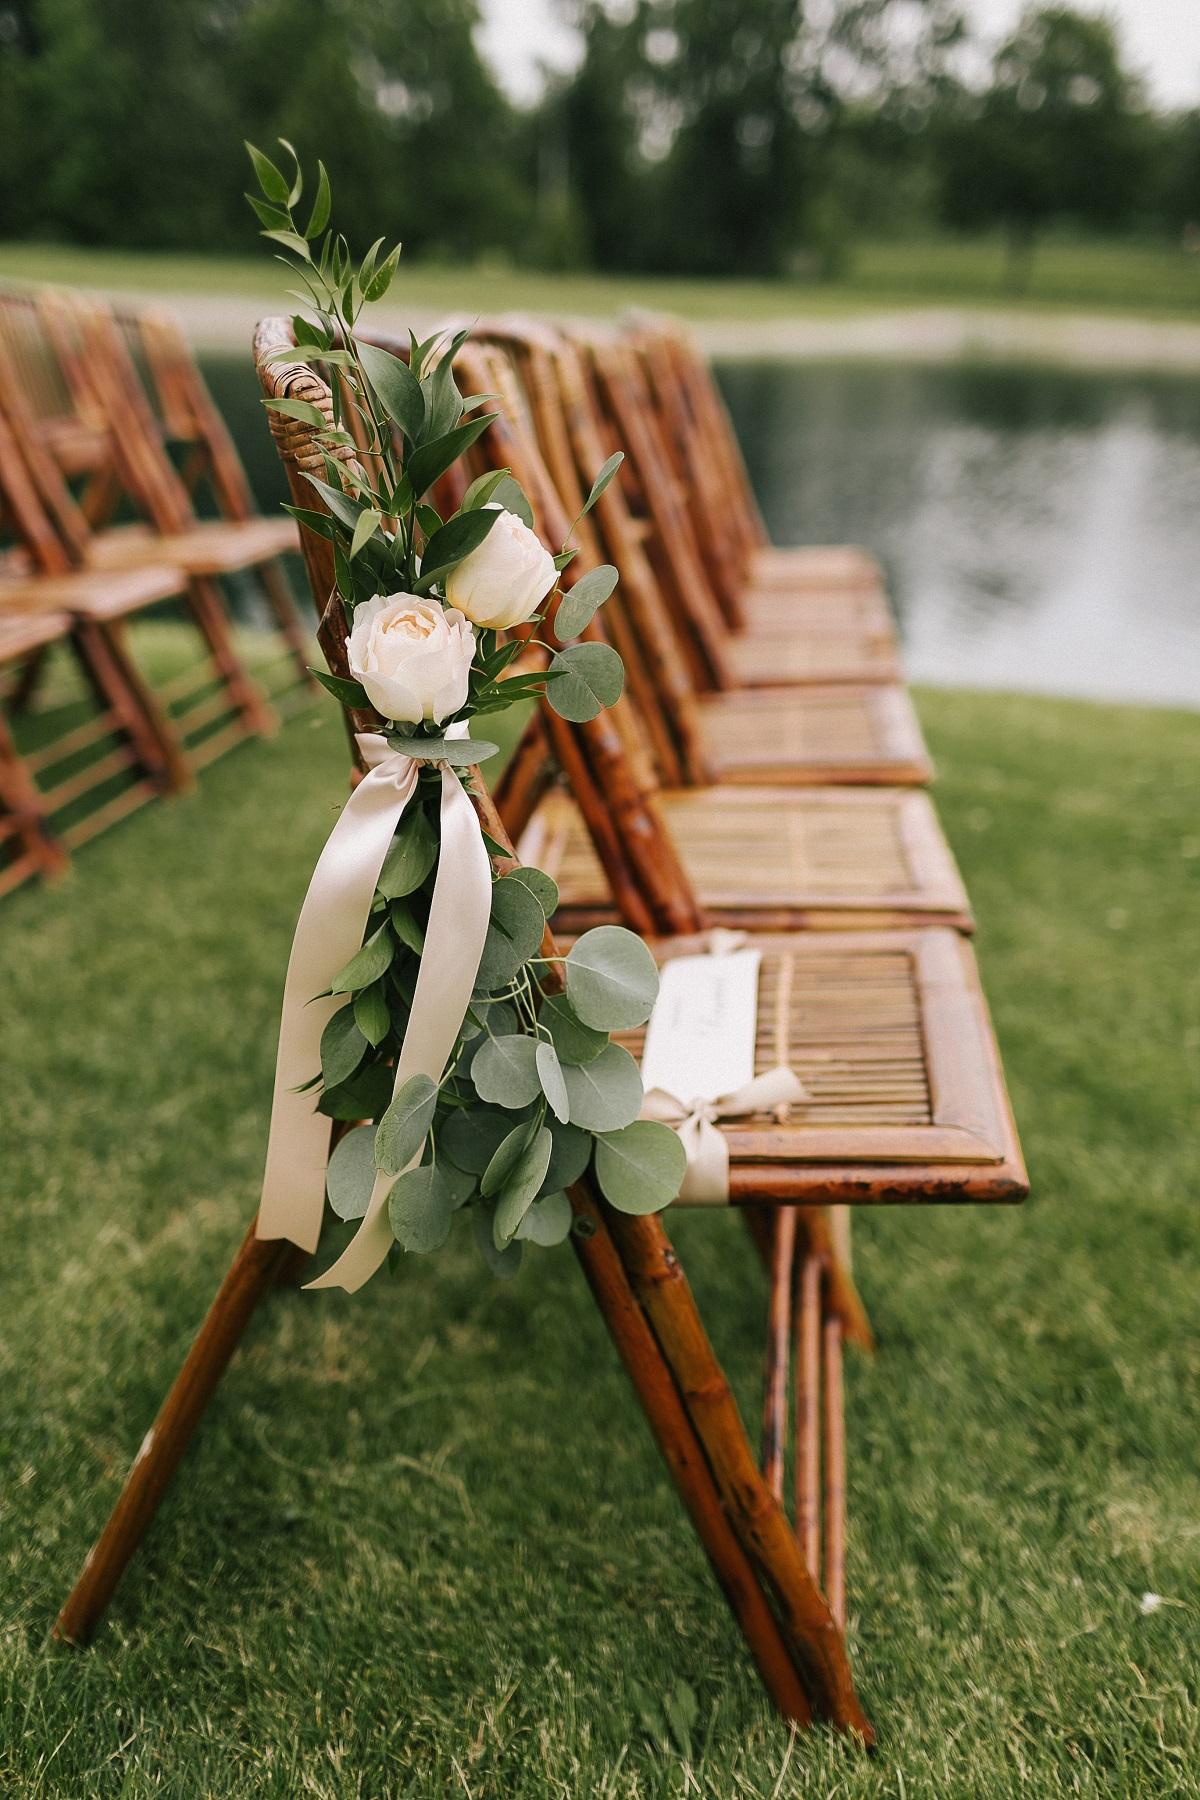 tented-wedding-planner-ancaster-kj-and-co 17.JPG